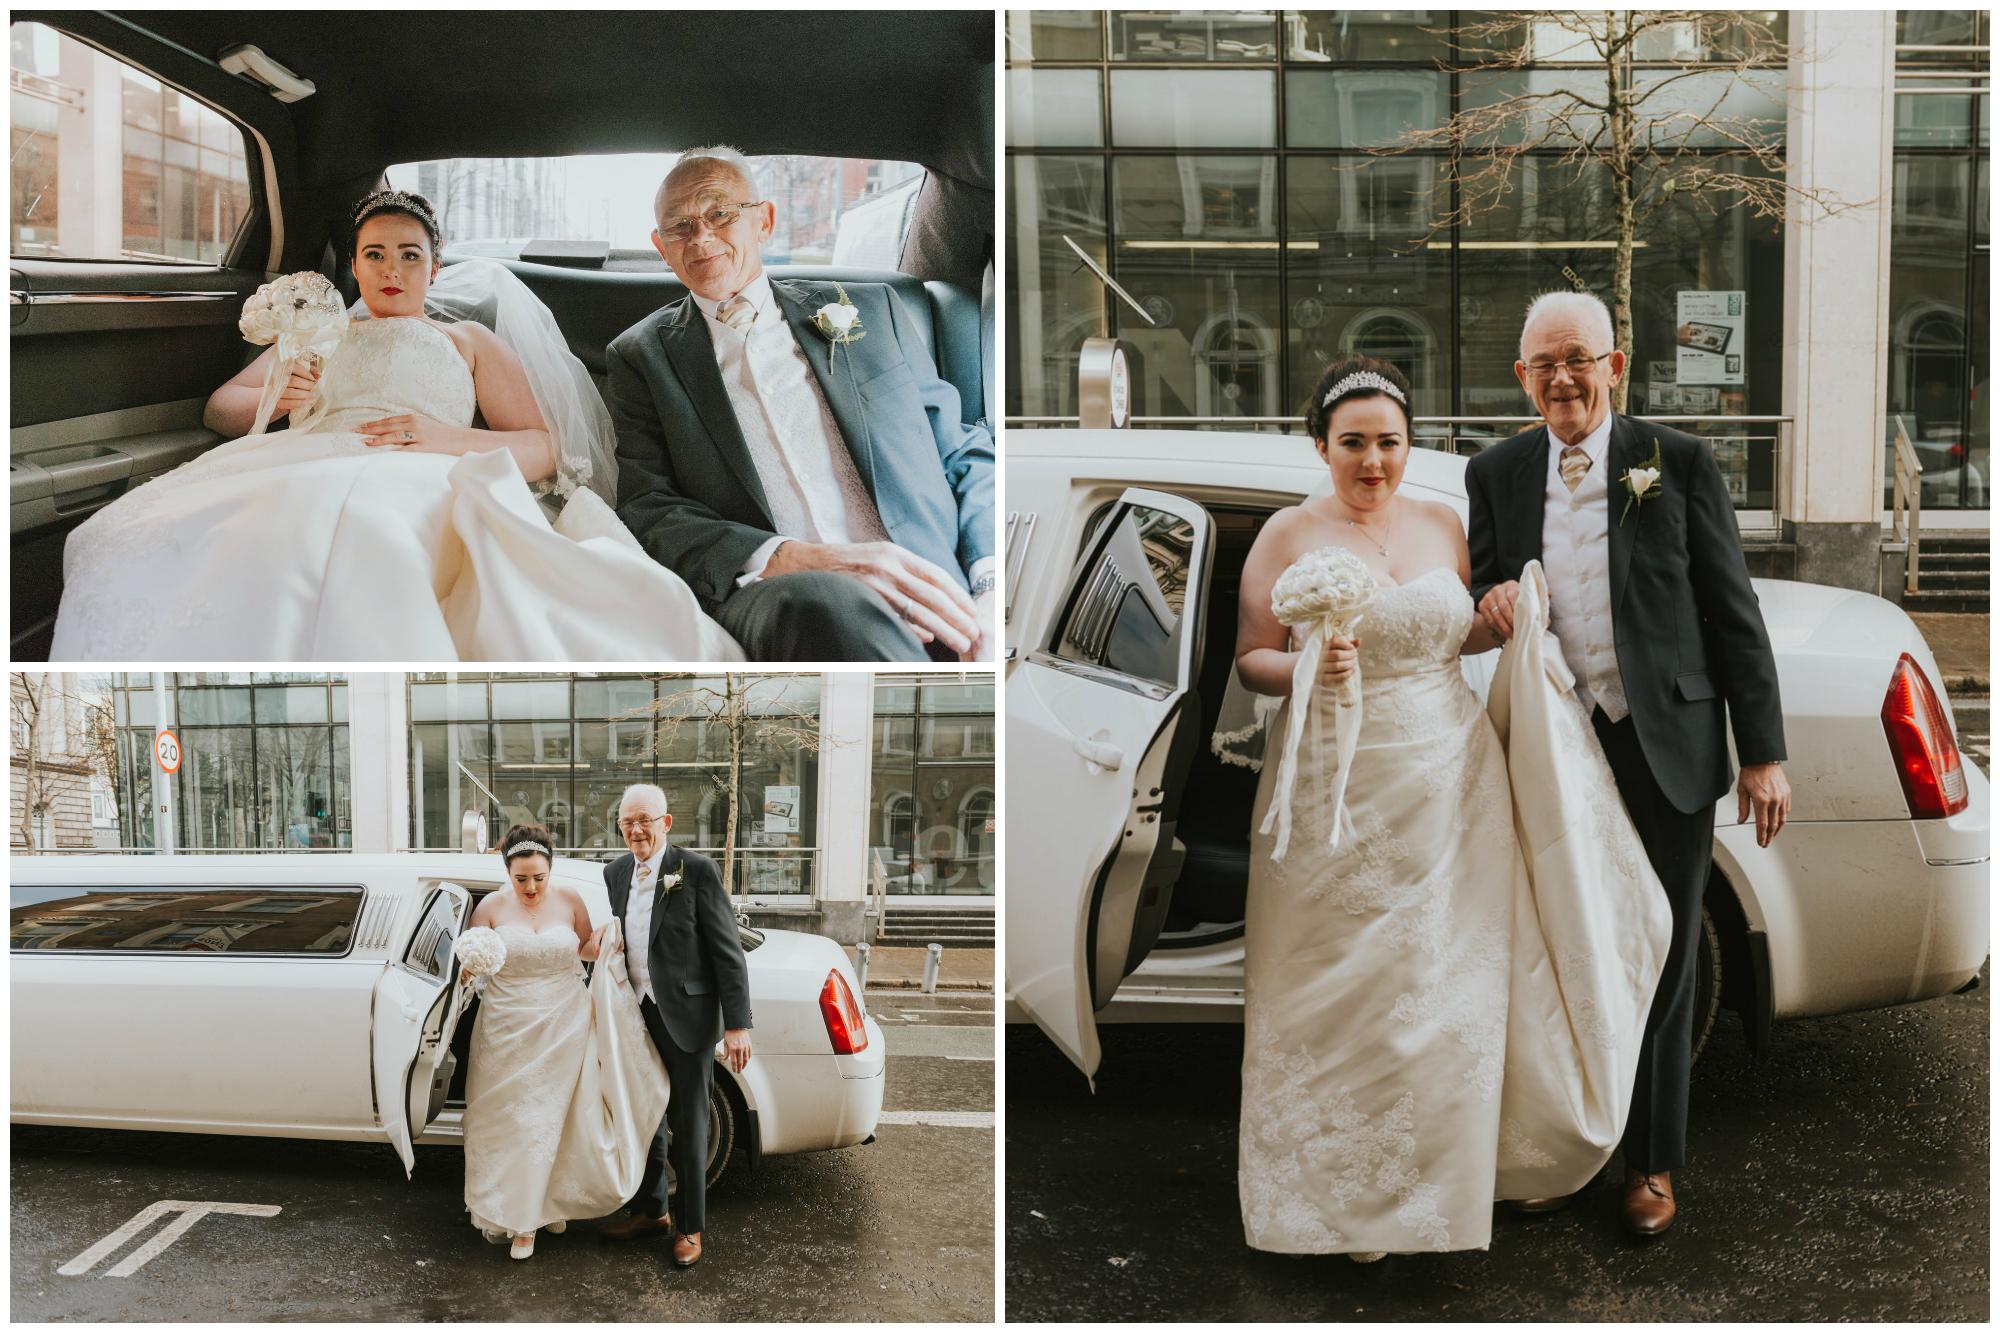 ten square hotel wedding ceremony belfast bride car